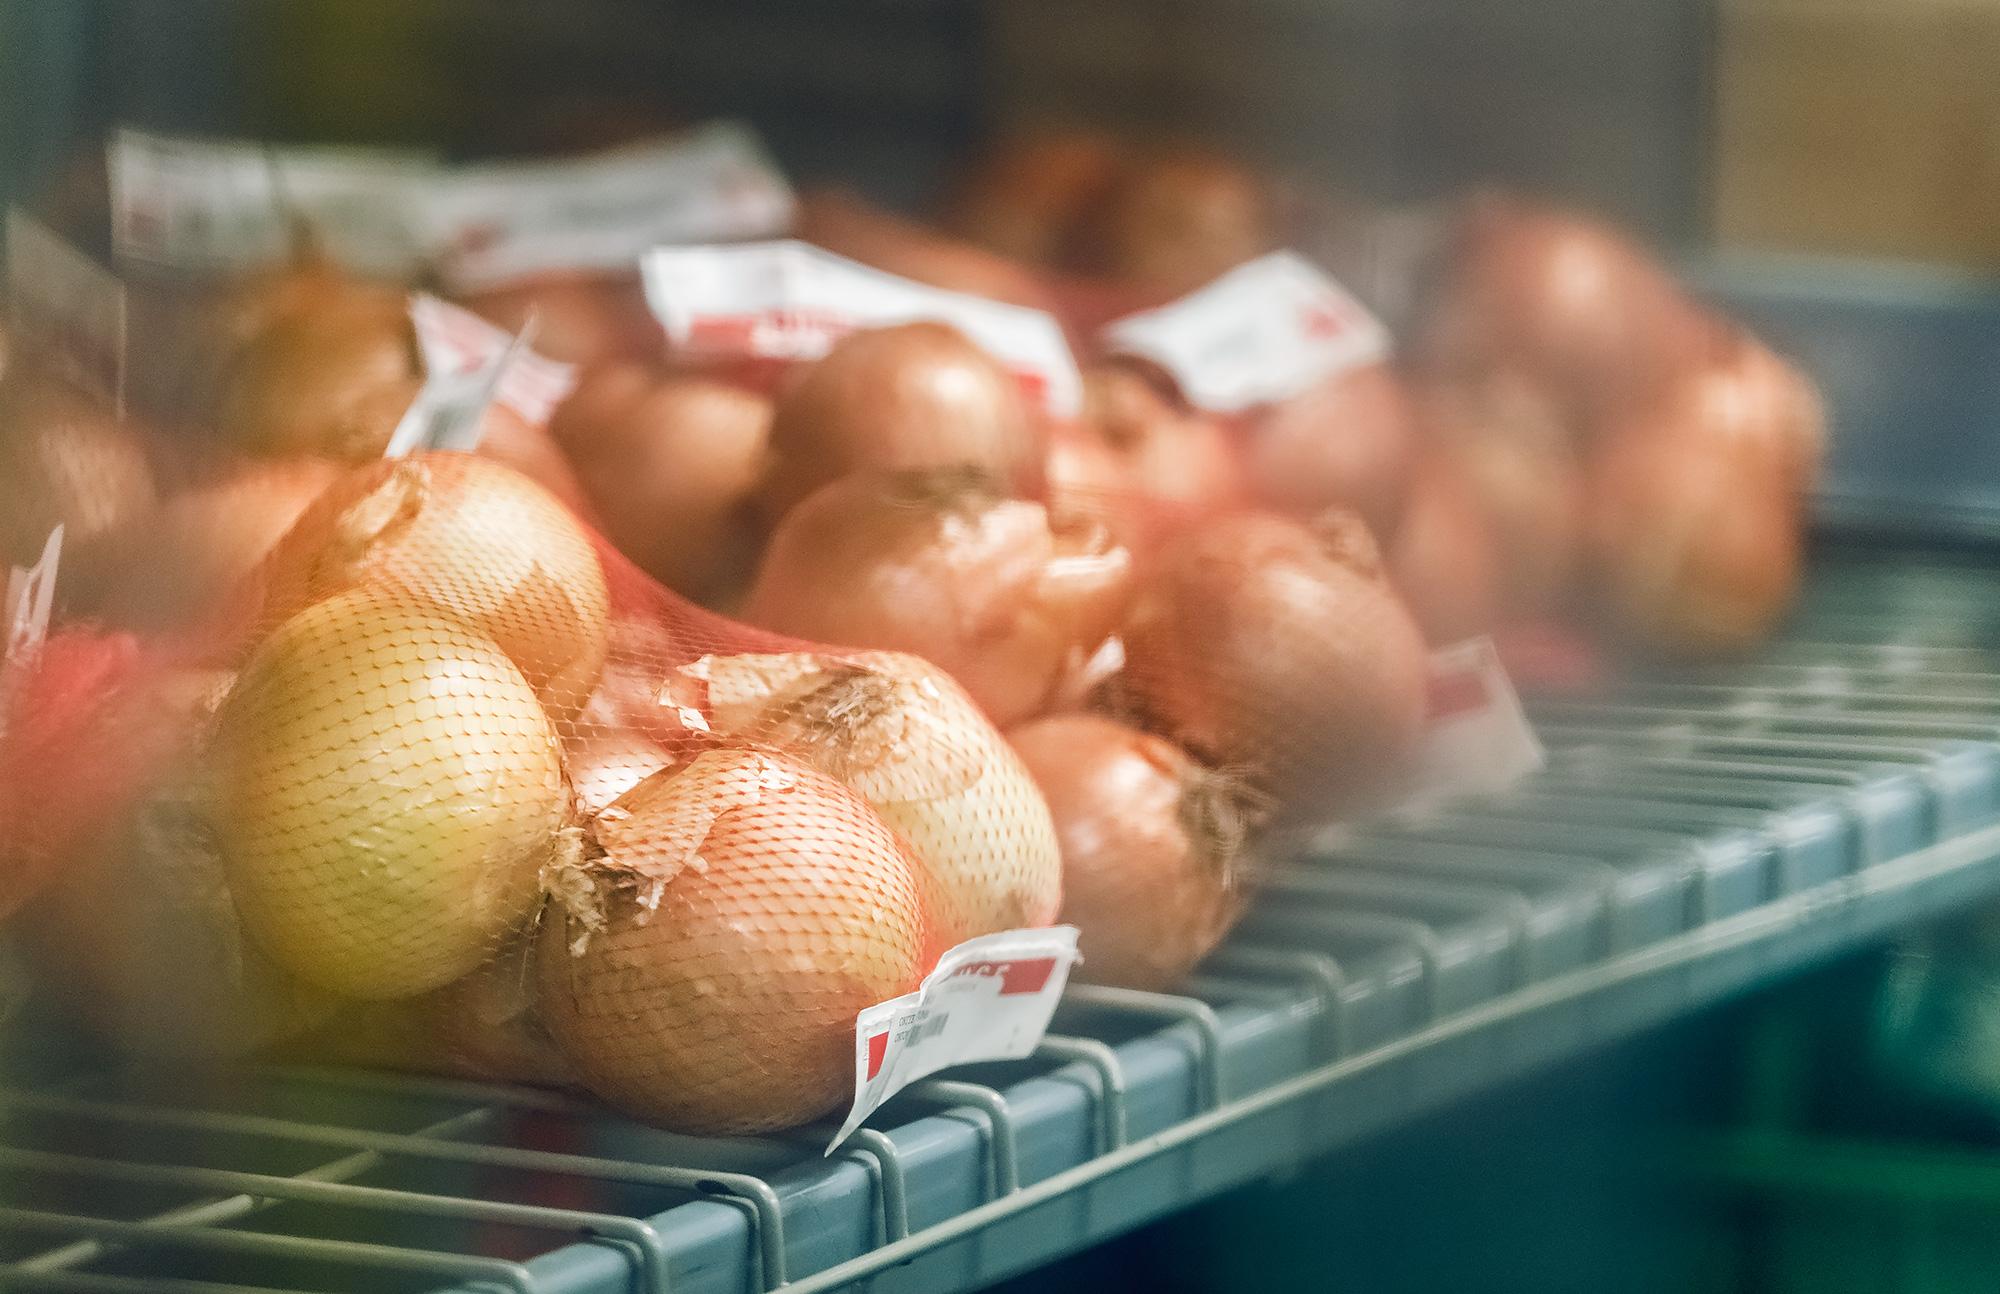 Onions through the Plastic